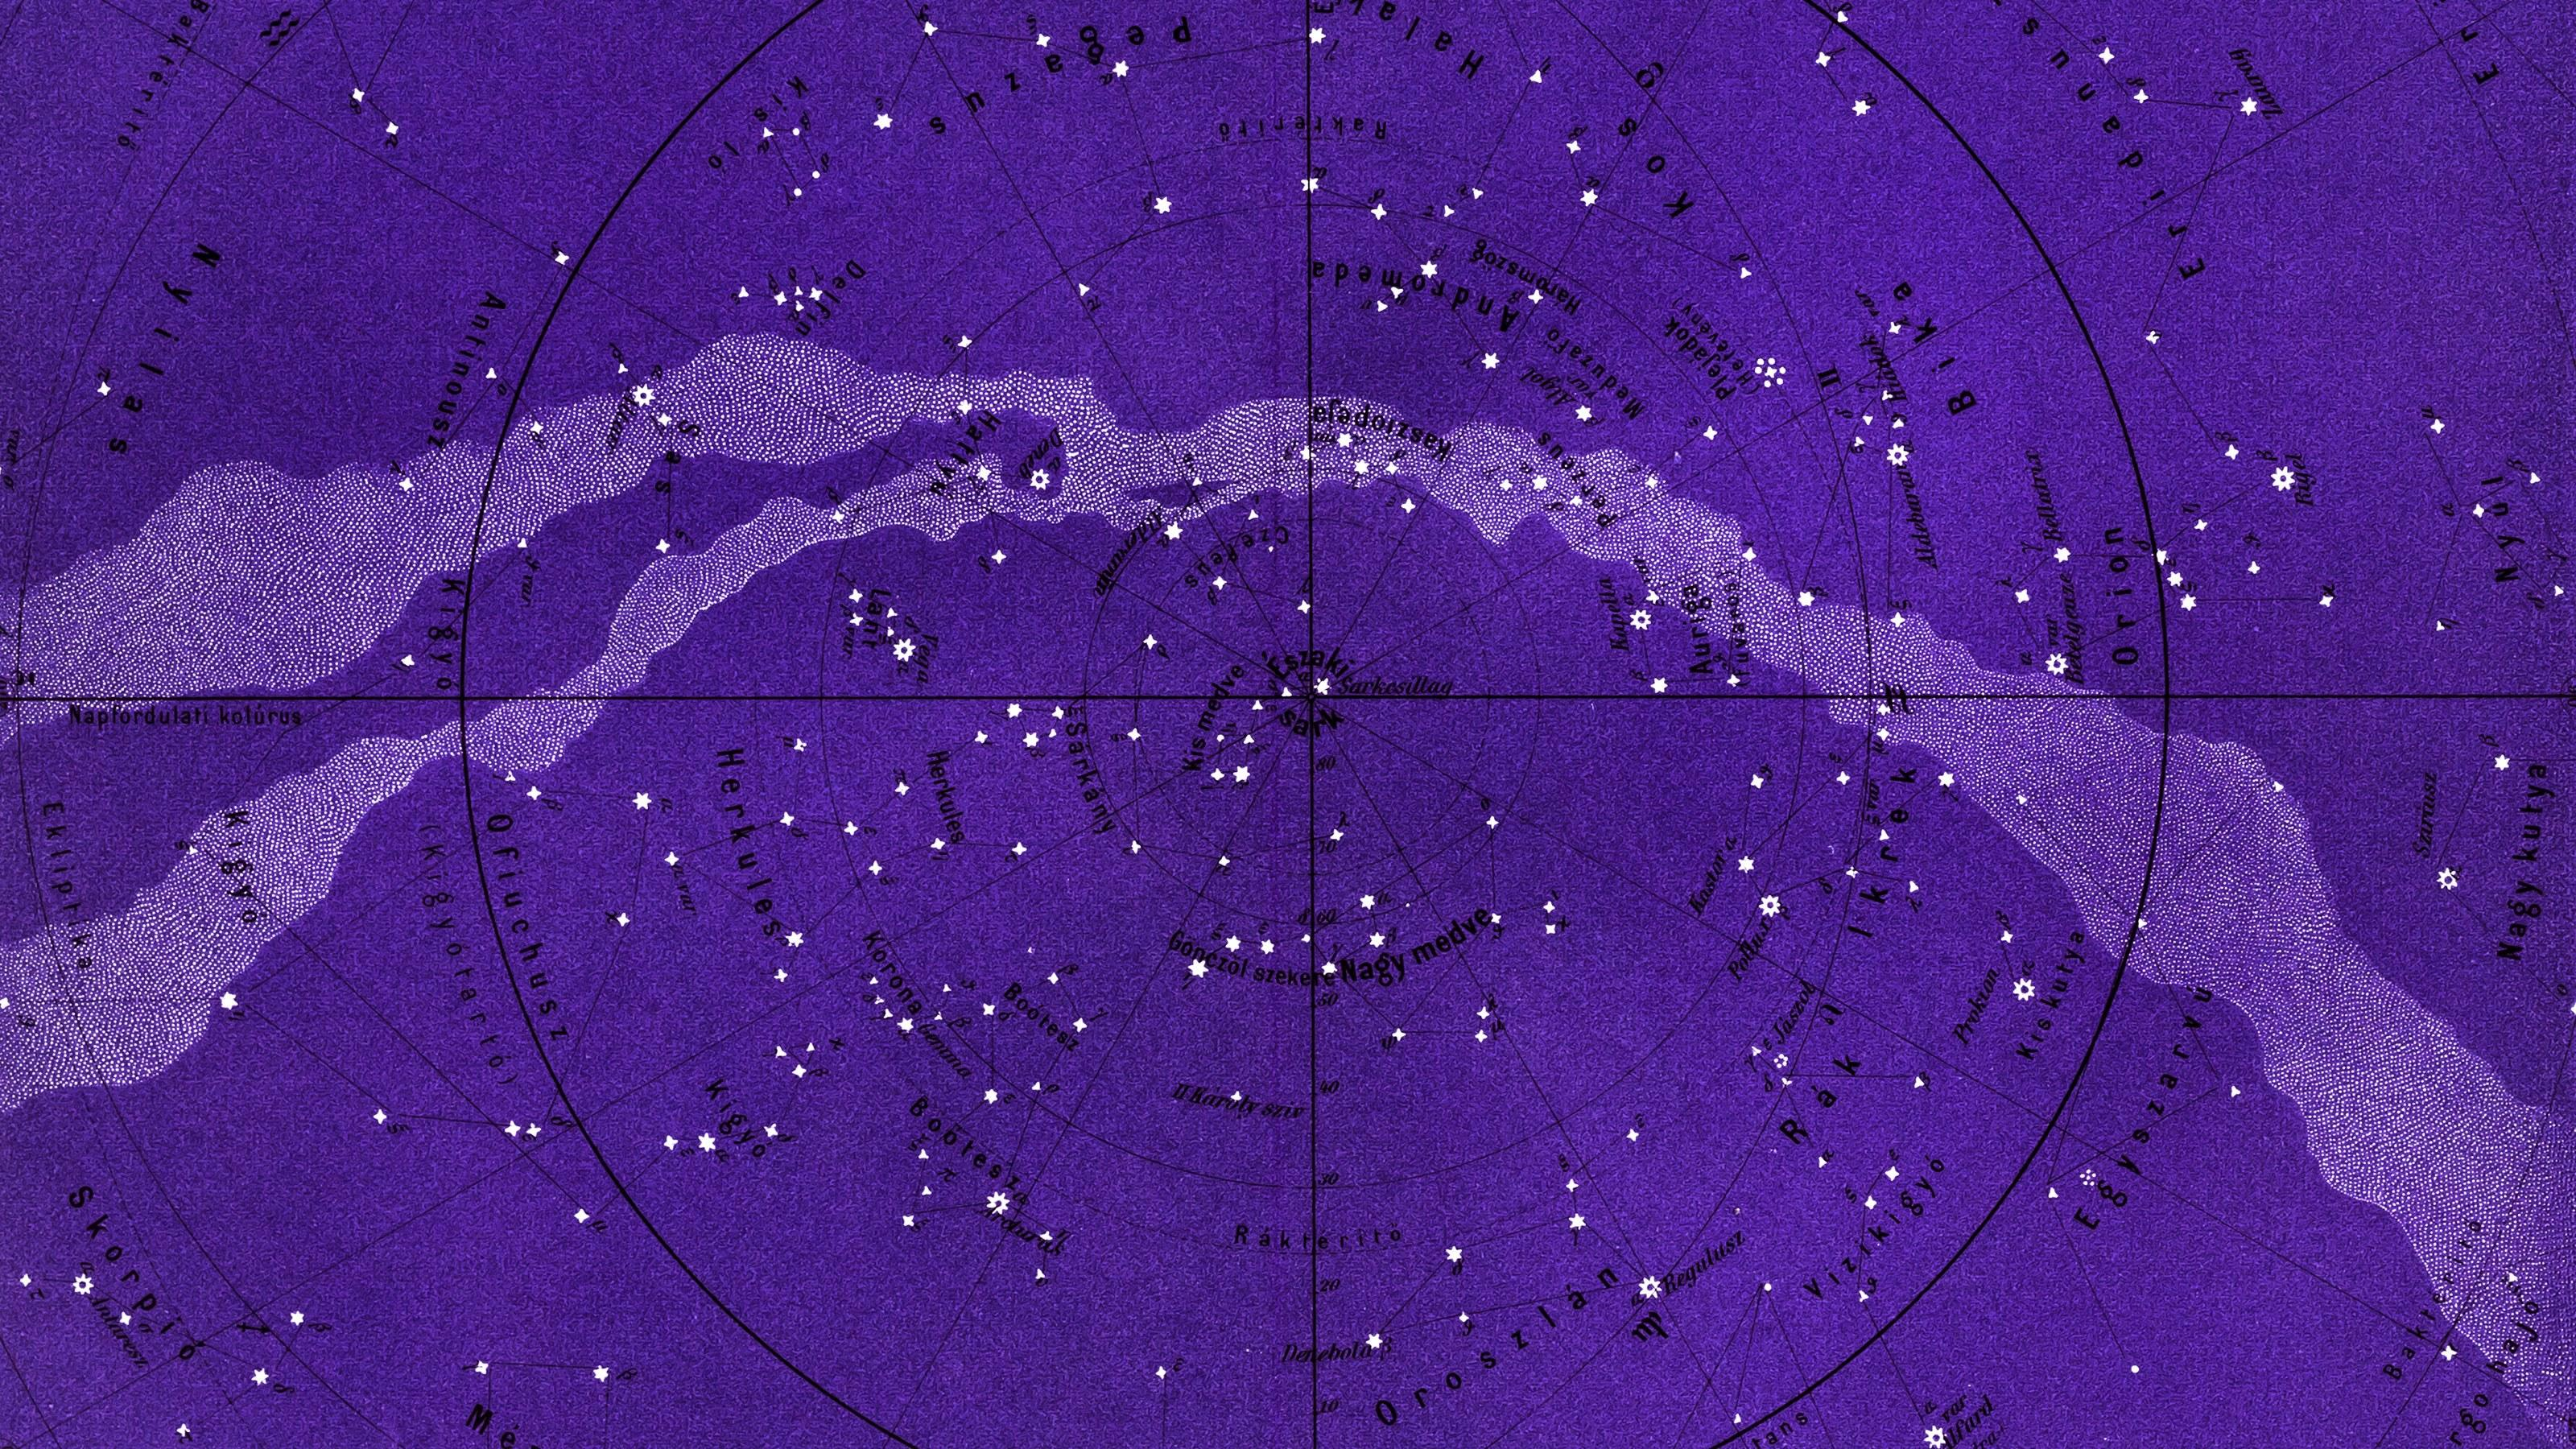 Your Horoscope for the Week of September 2, 2019